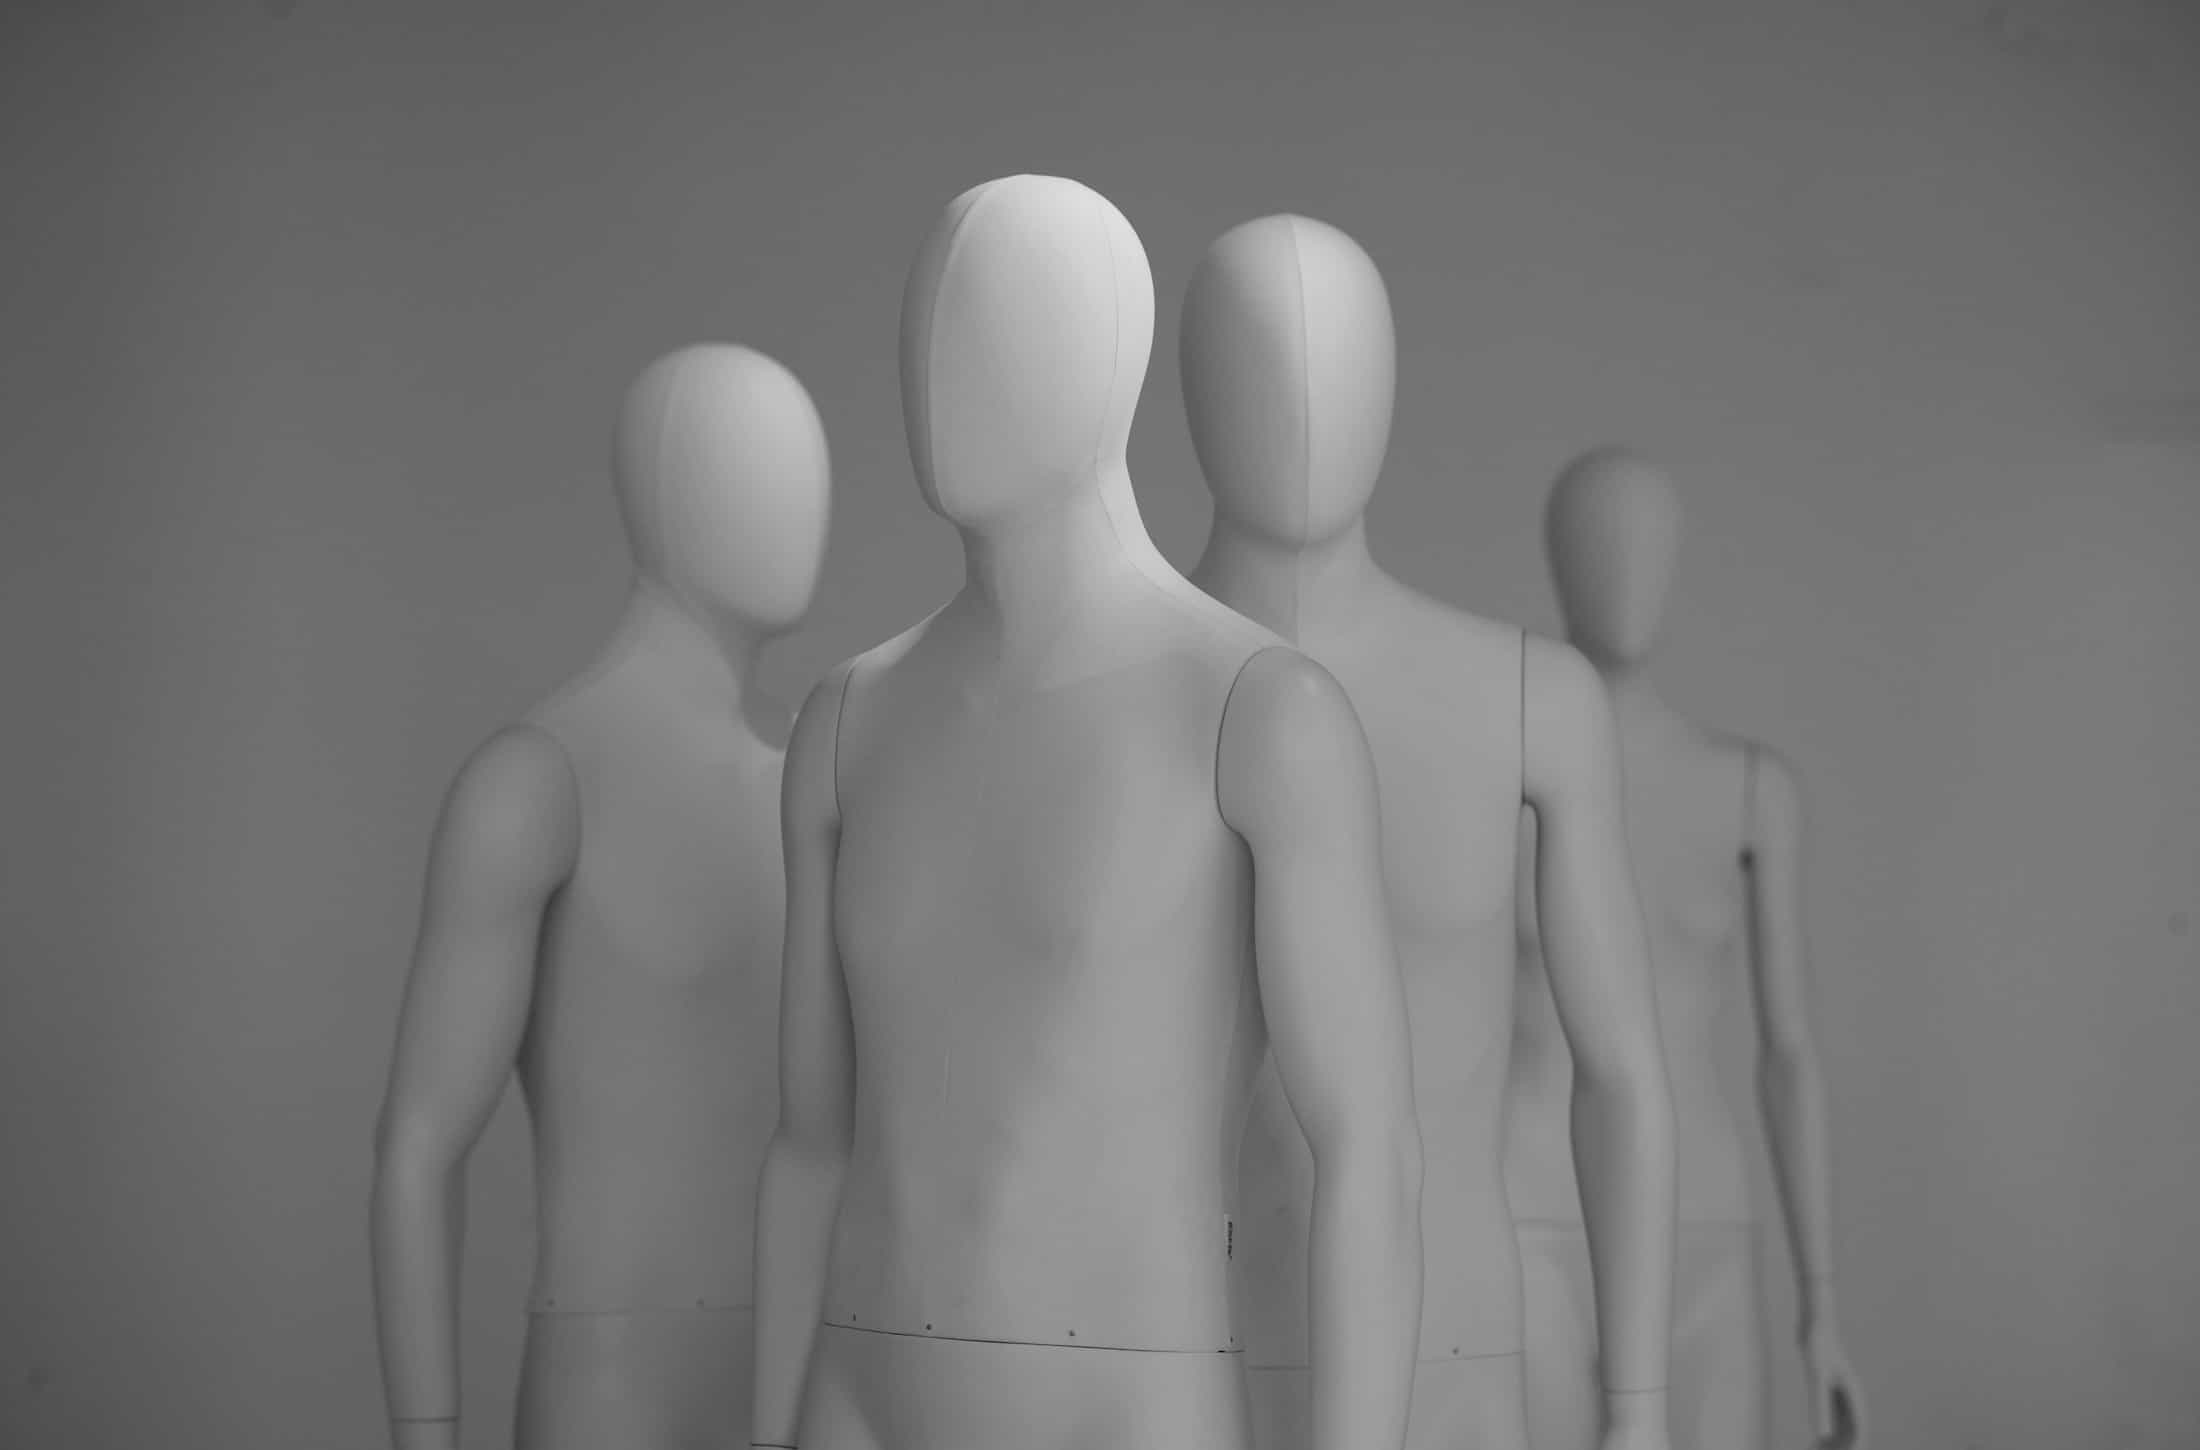 bonaveri fashion model mannequin collection 04